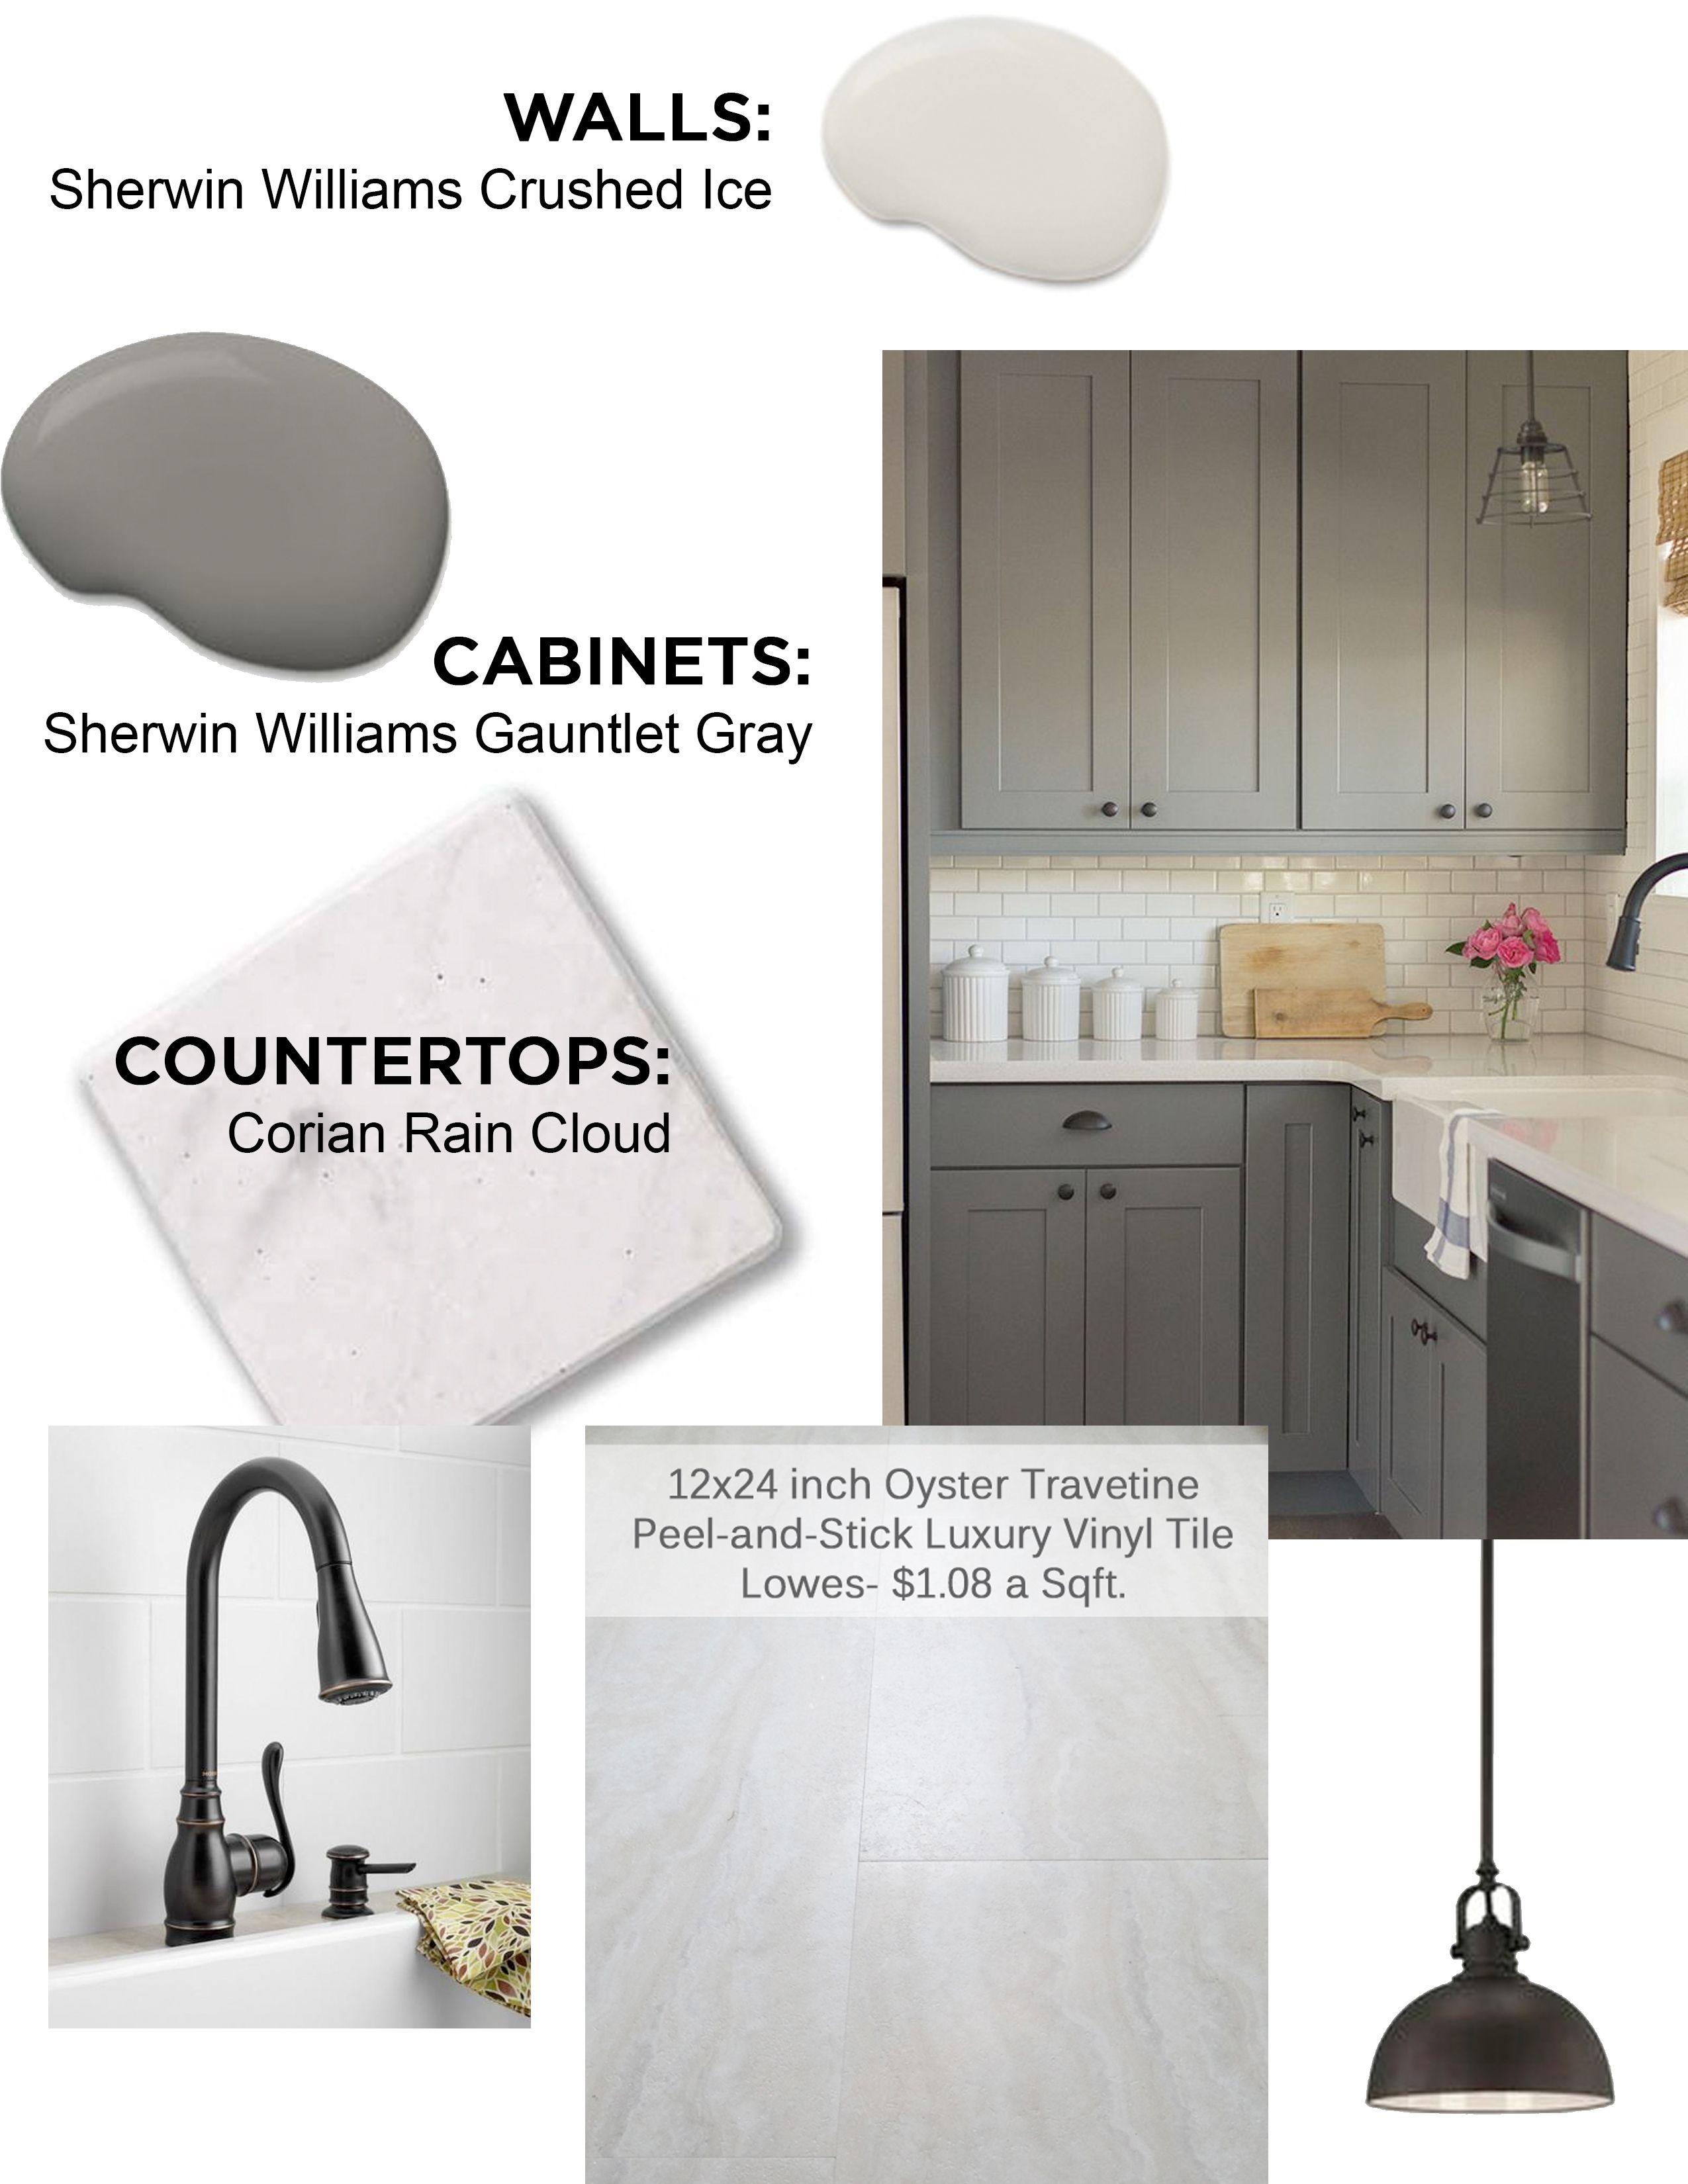 Warm Gray And White Kitchen Mood Board Grey Countertops Kitchen Mood Board Gray And White Kitchen